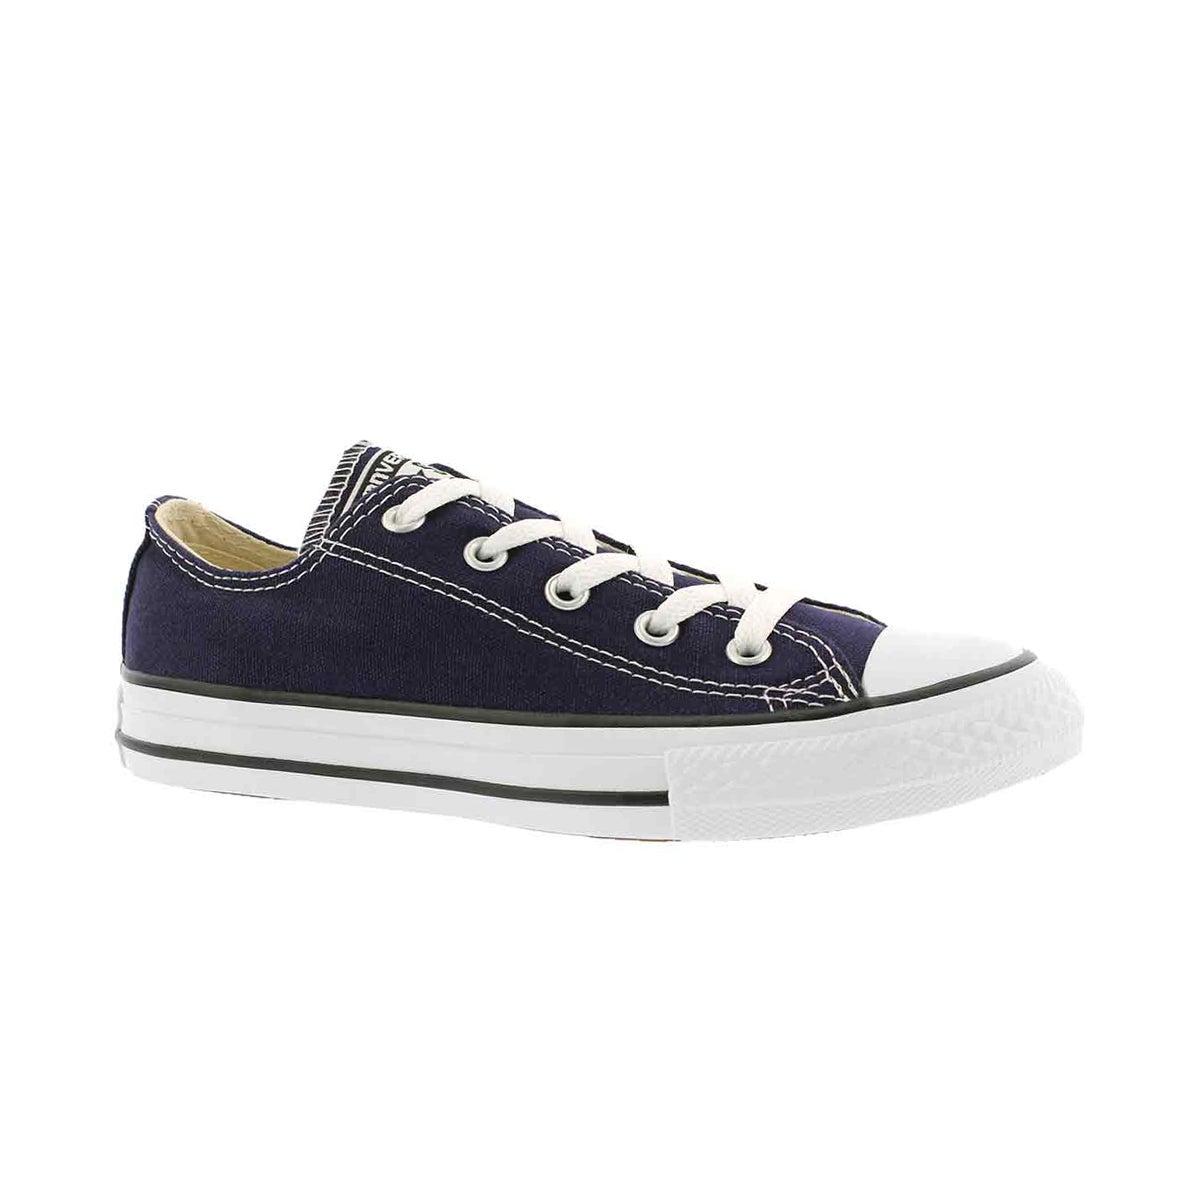 Kids' CT ALL STAR SEASONAL mdnt indigo sneakers